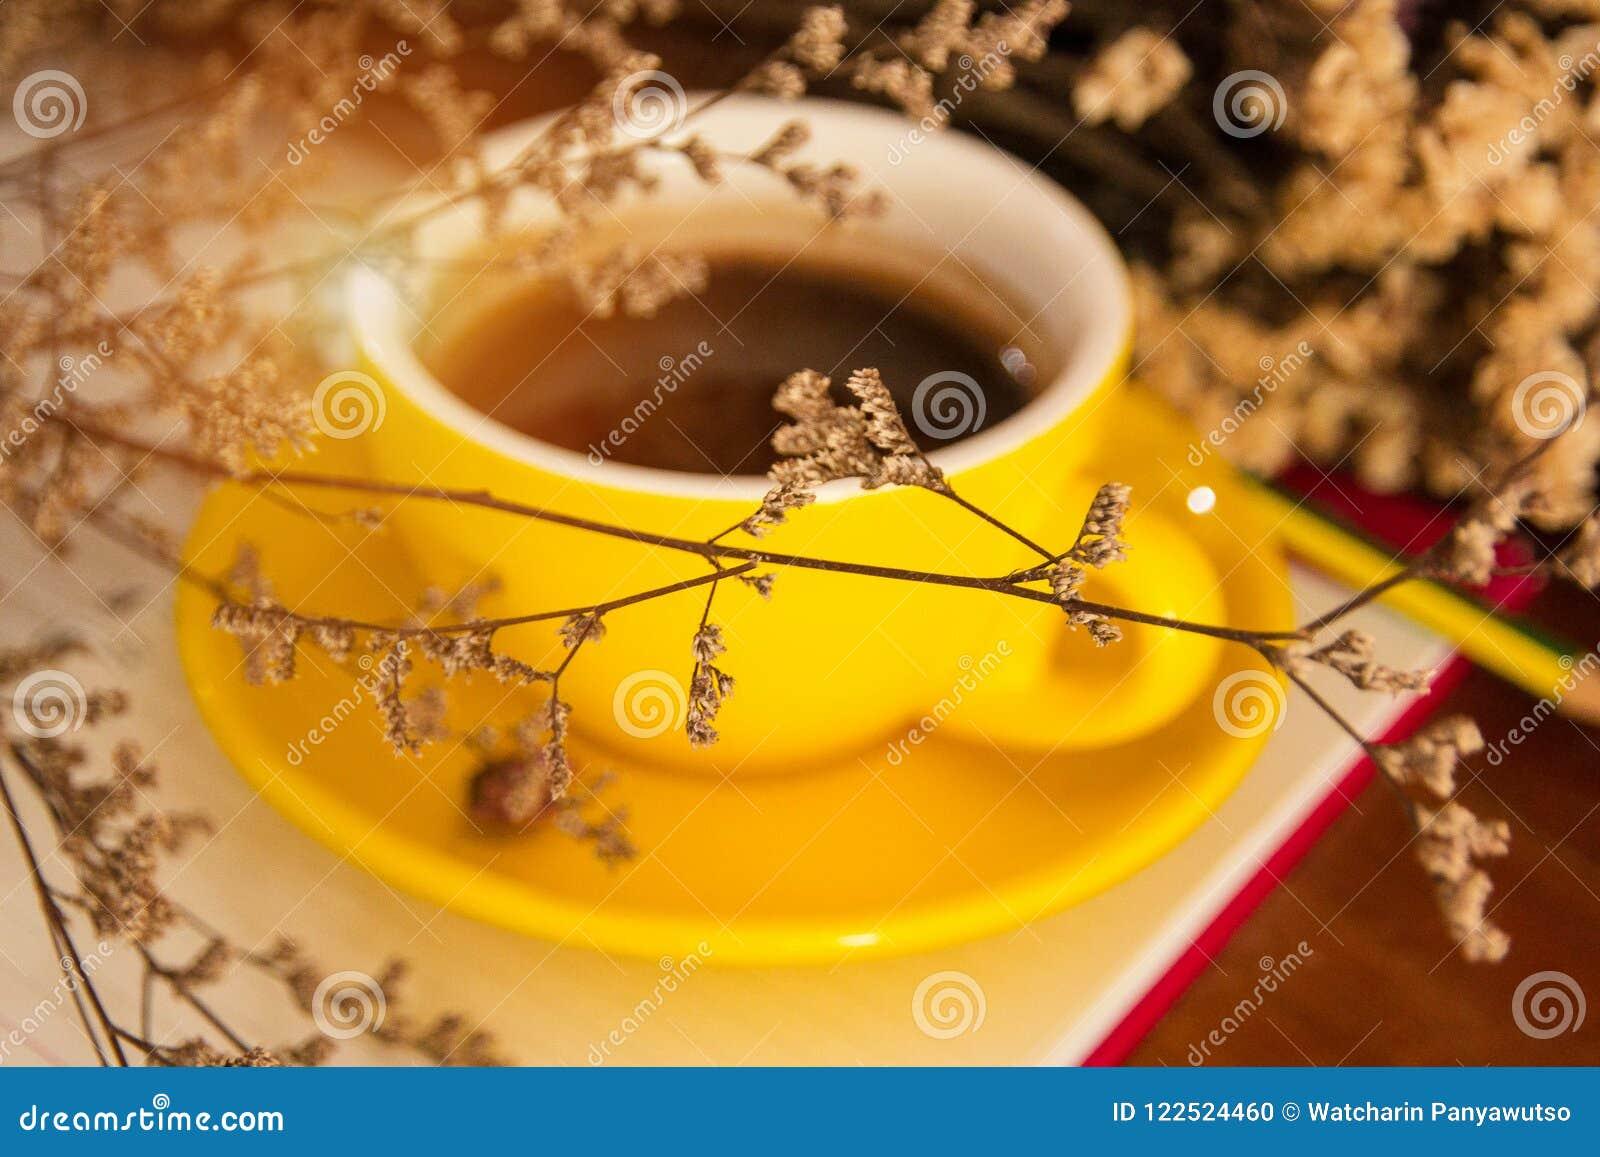 O fundo claro obscuro do projeto do copo de café cerâmico amarelo pôs na parte traseira do estilo secado da flor, do vintage e da